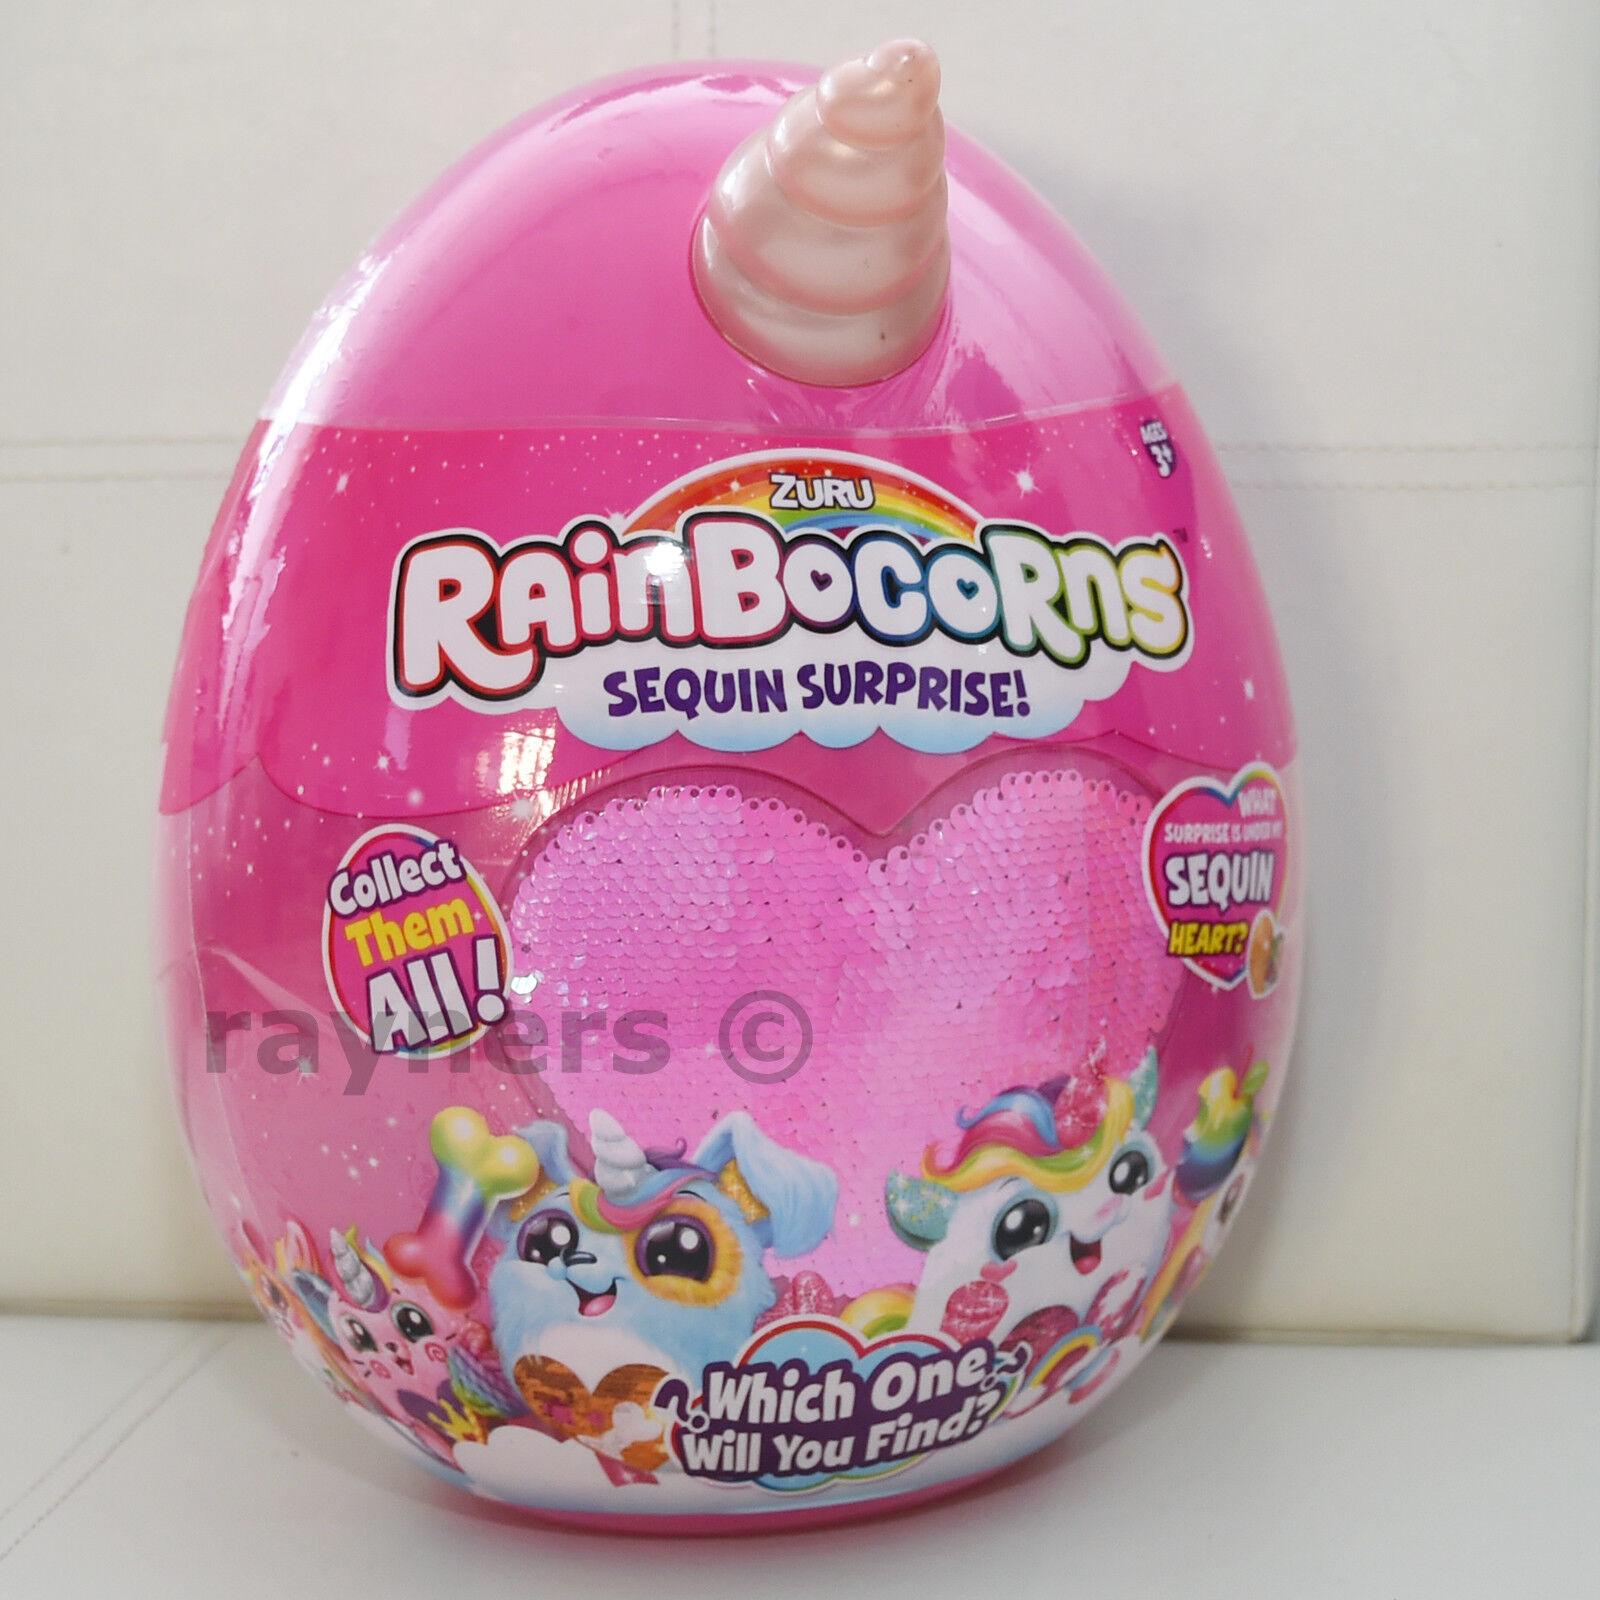 (Choose Colour) New Rainbocorns Rainbocorn Egg Sequin Surprise Genuine by Zuru